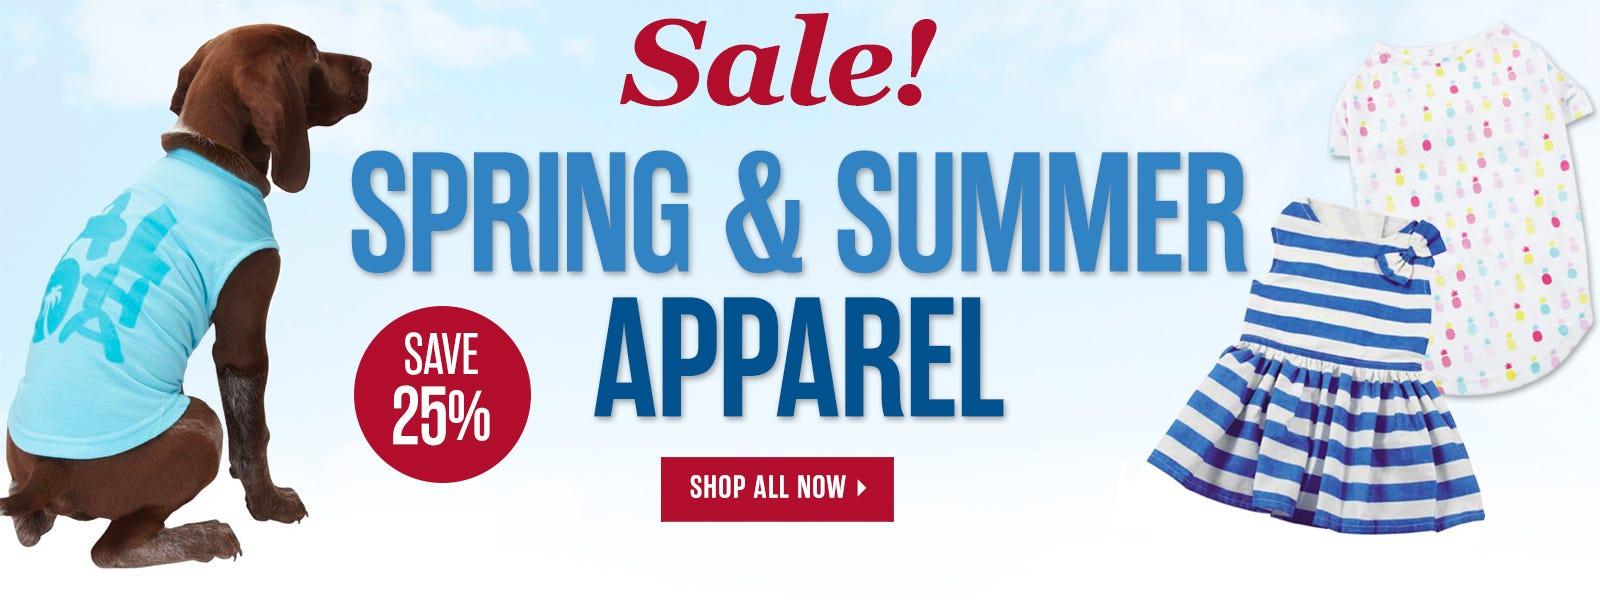 Spring Apparel Sale